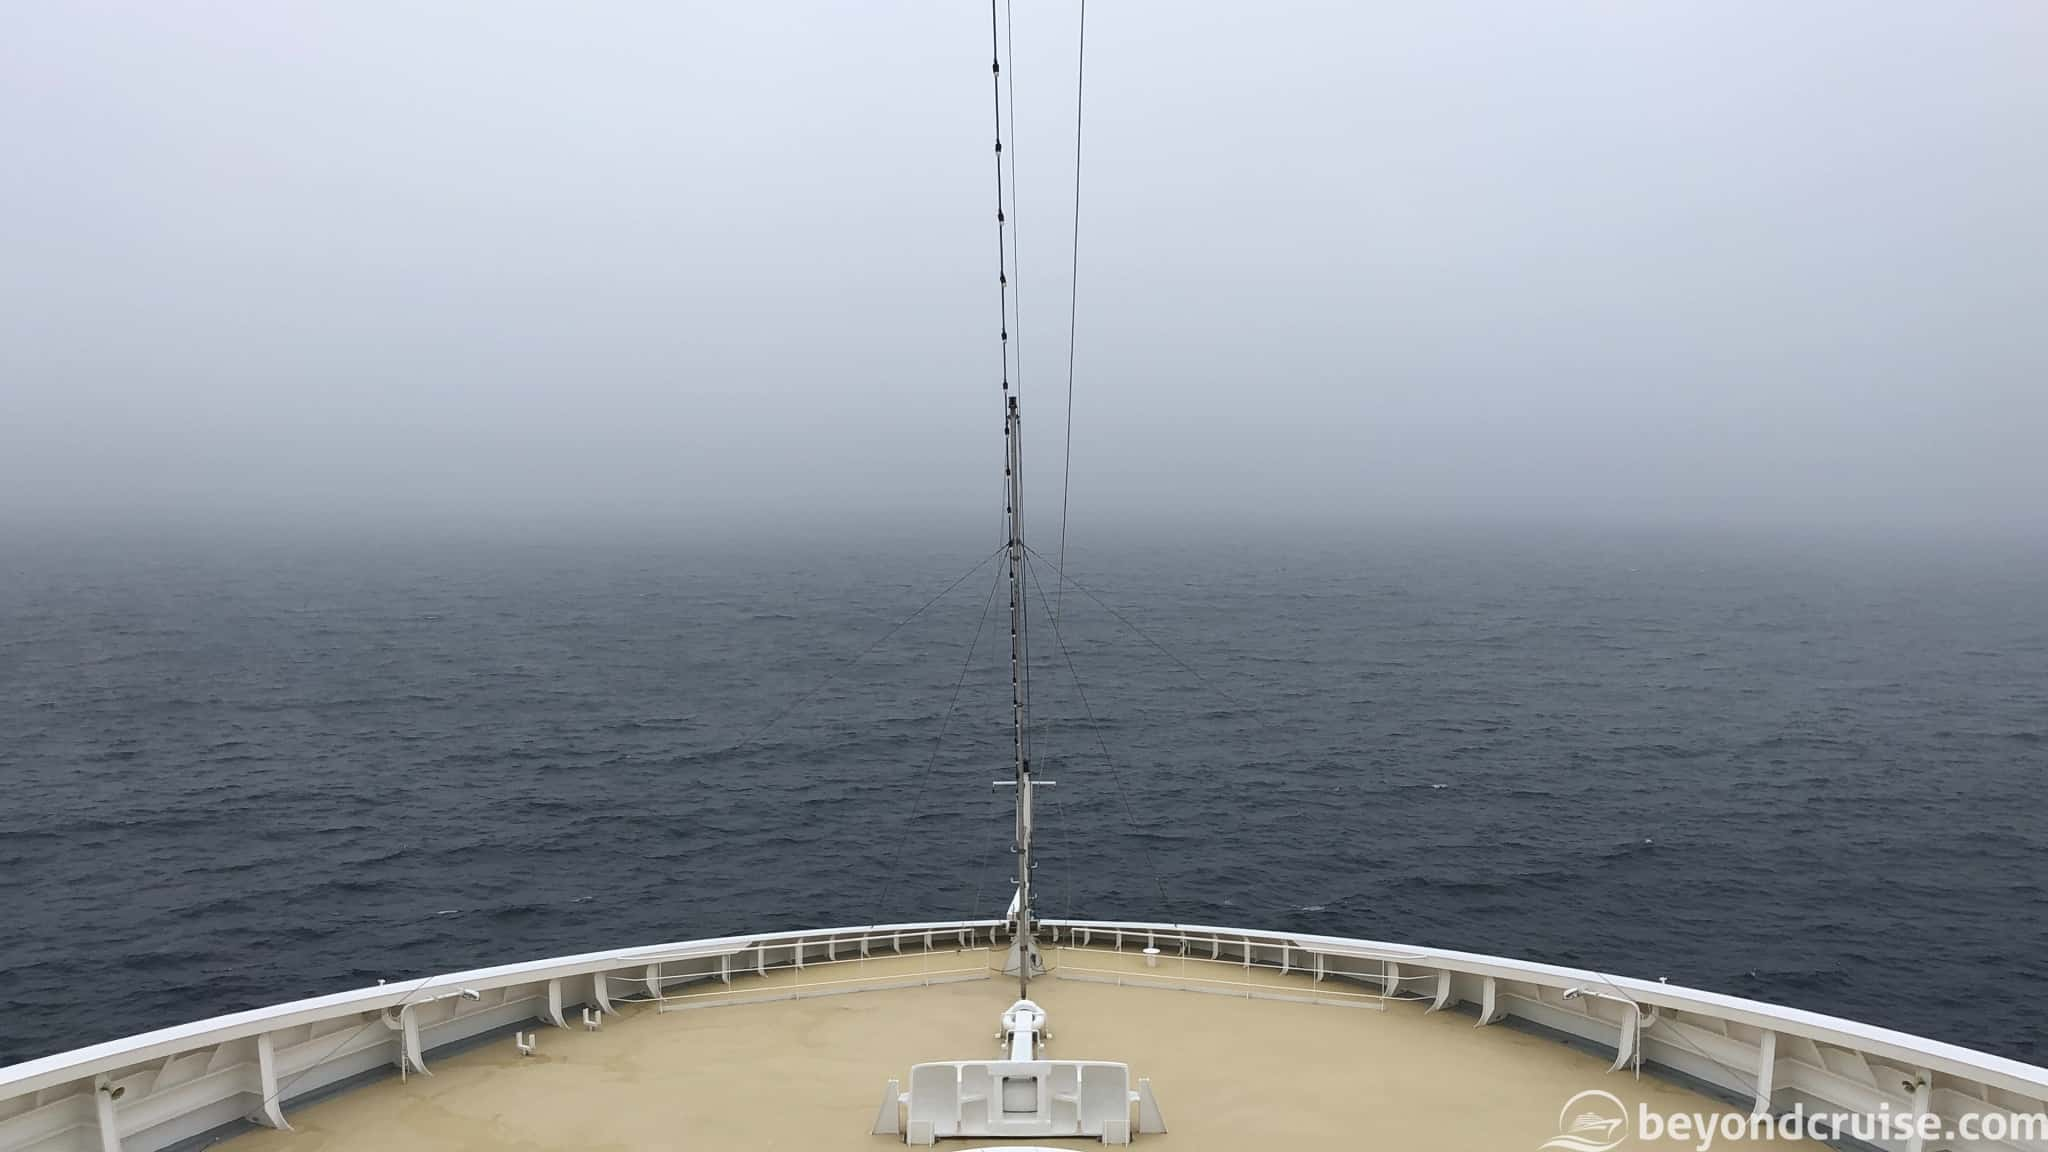 MSC Magnifica in a foggy Atlantic Ocean